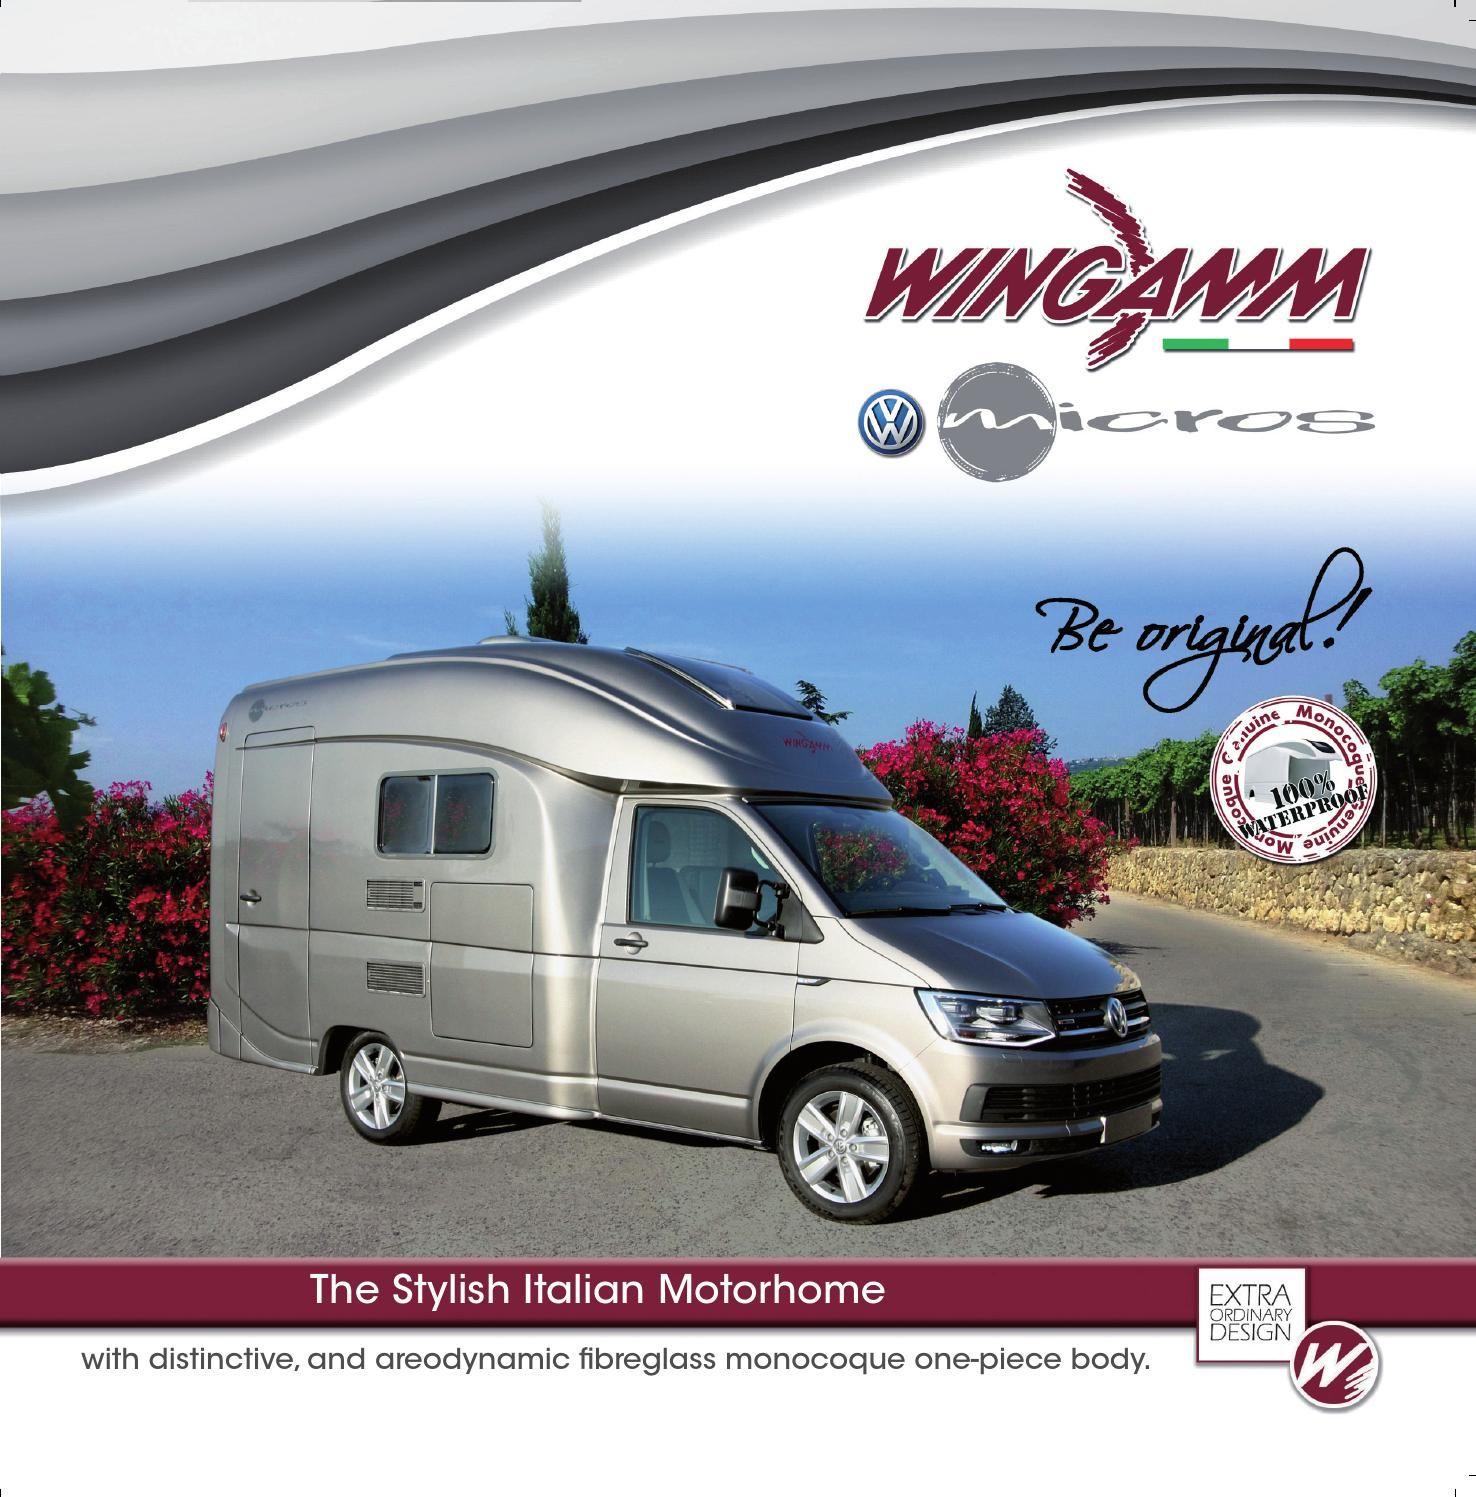 Wingamm Micros En Camping Camper Motorhome Car Camping